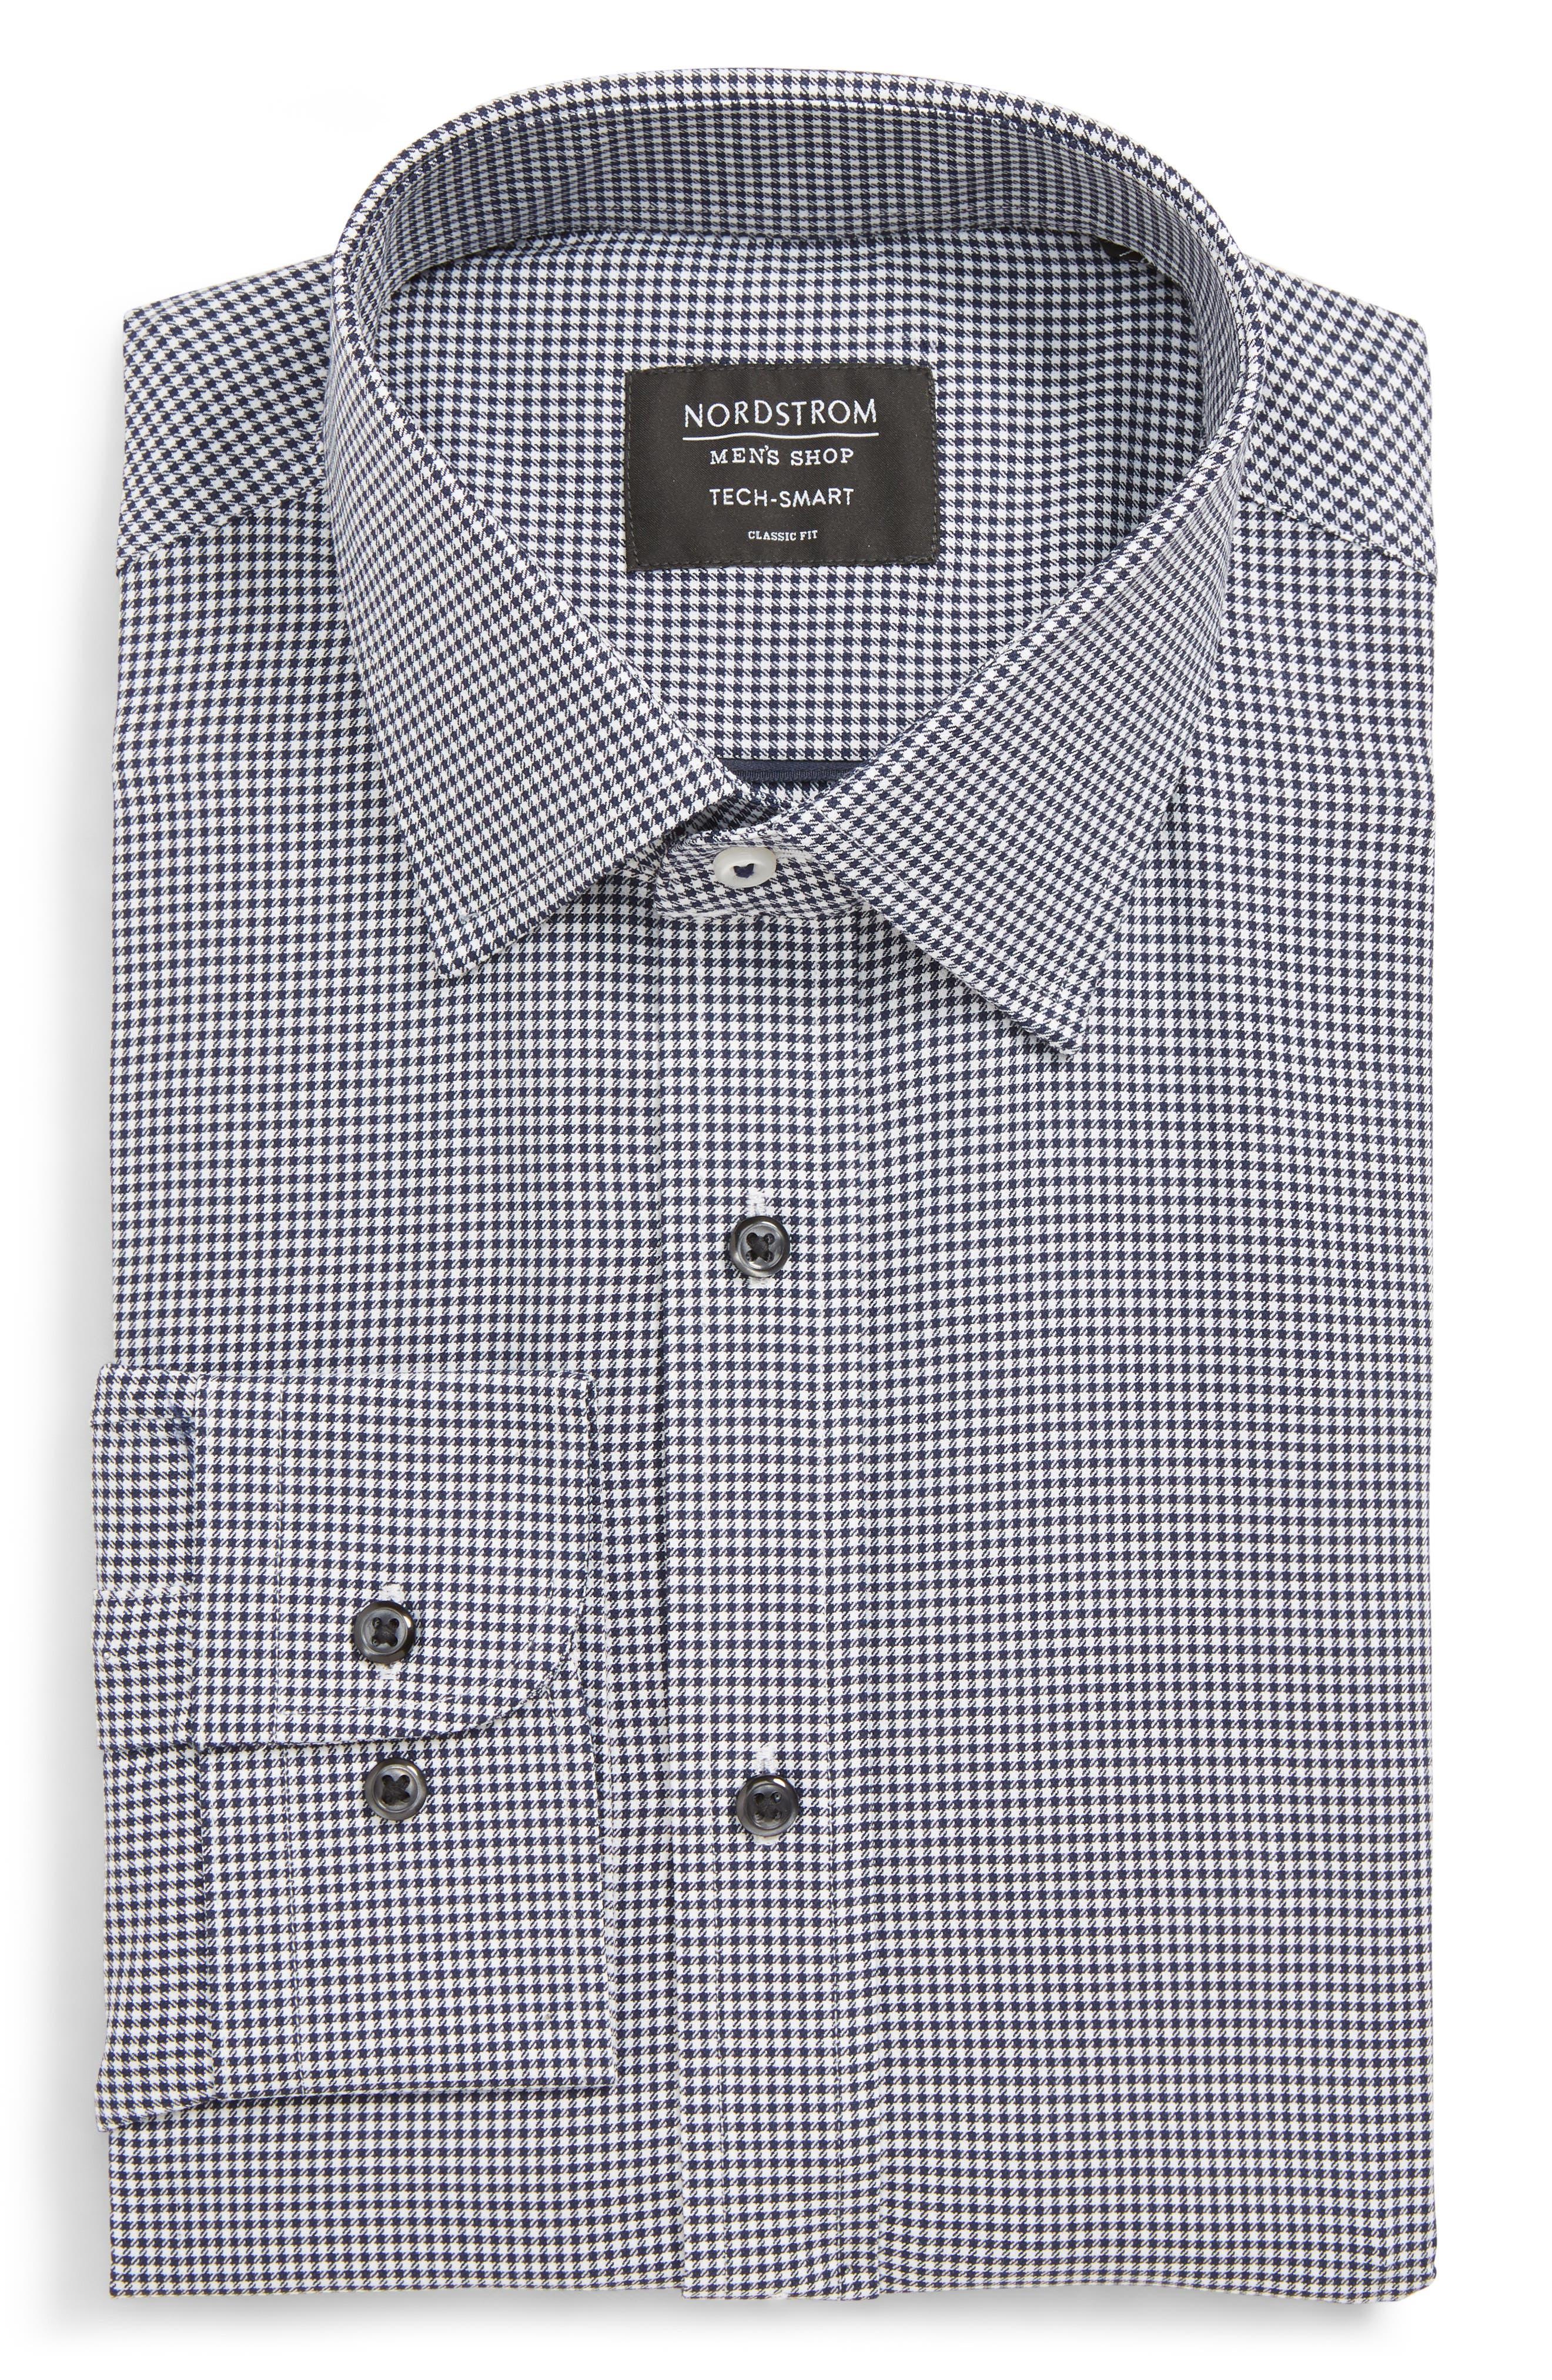 Tech-Smart Classic Fit Stretch Check Dress Shirt,                             Main thumbnail 1, color,                             NAVY PEACOAT